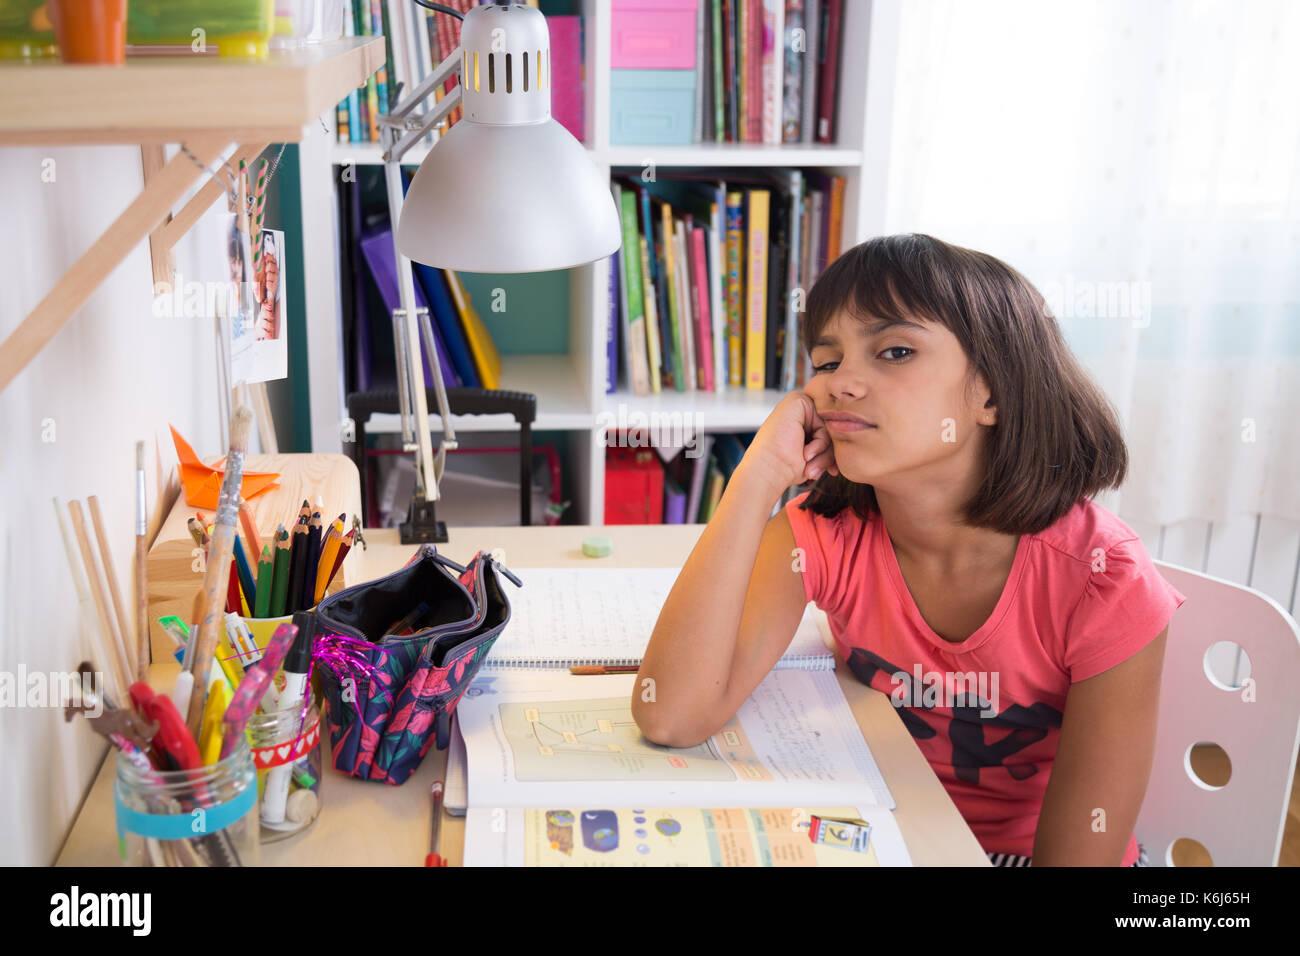 Bored school girl doing homework at home. Looking at camera - Stock Image